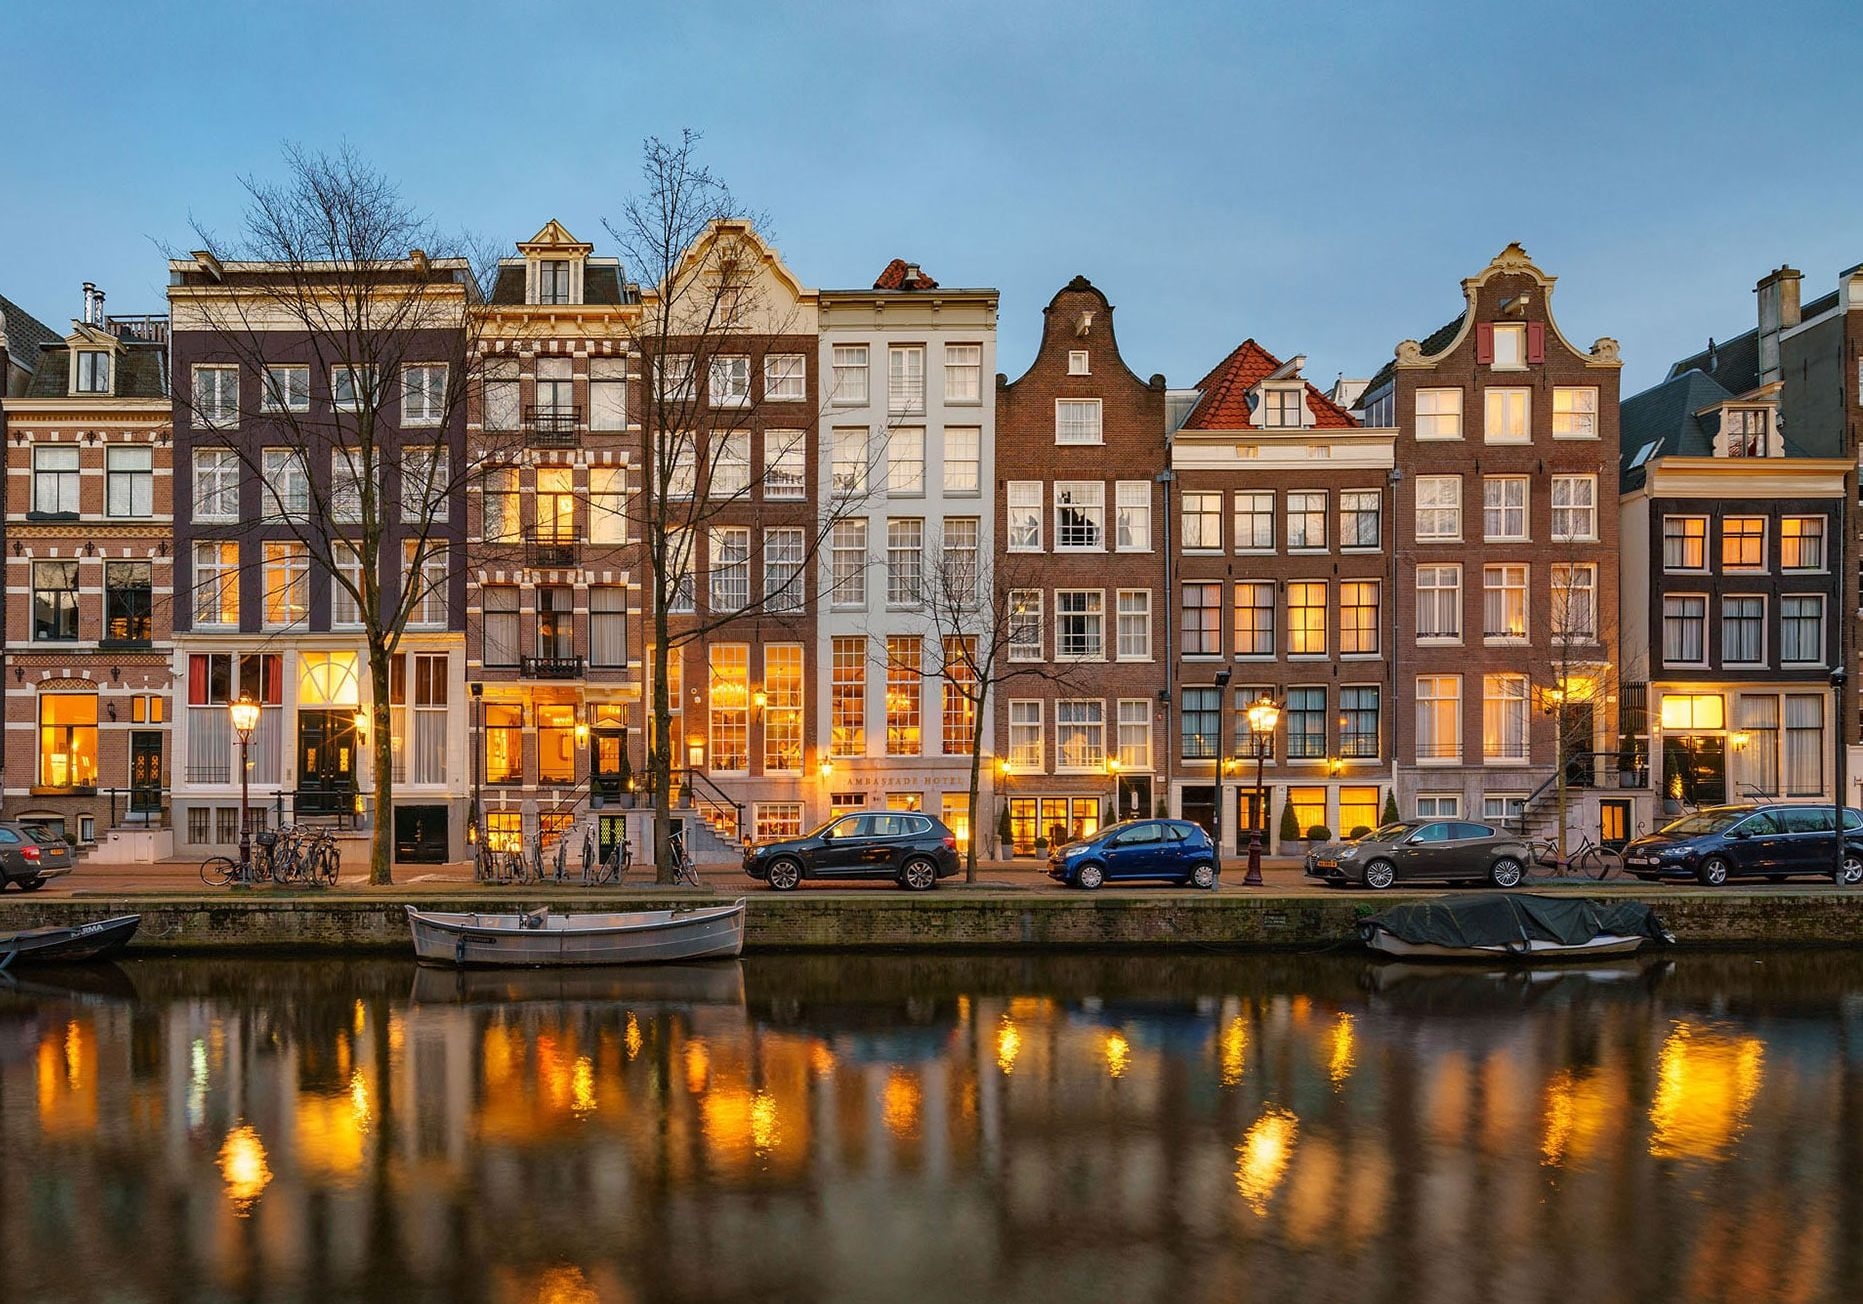 Brasserie-Ambassade-Herengracht-Zoom-3